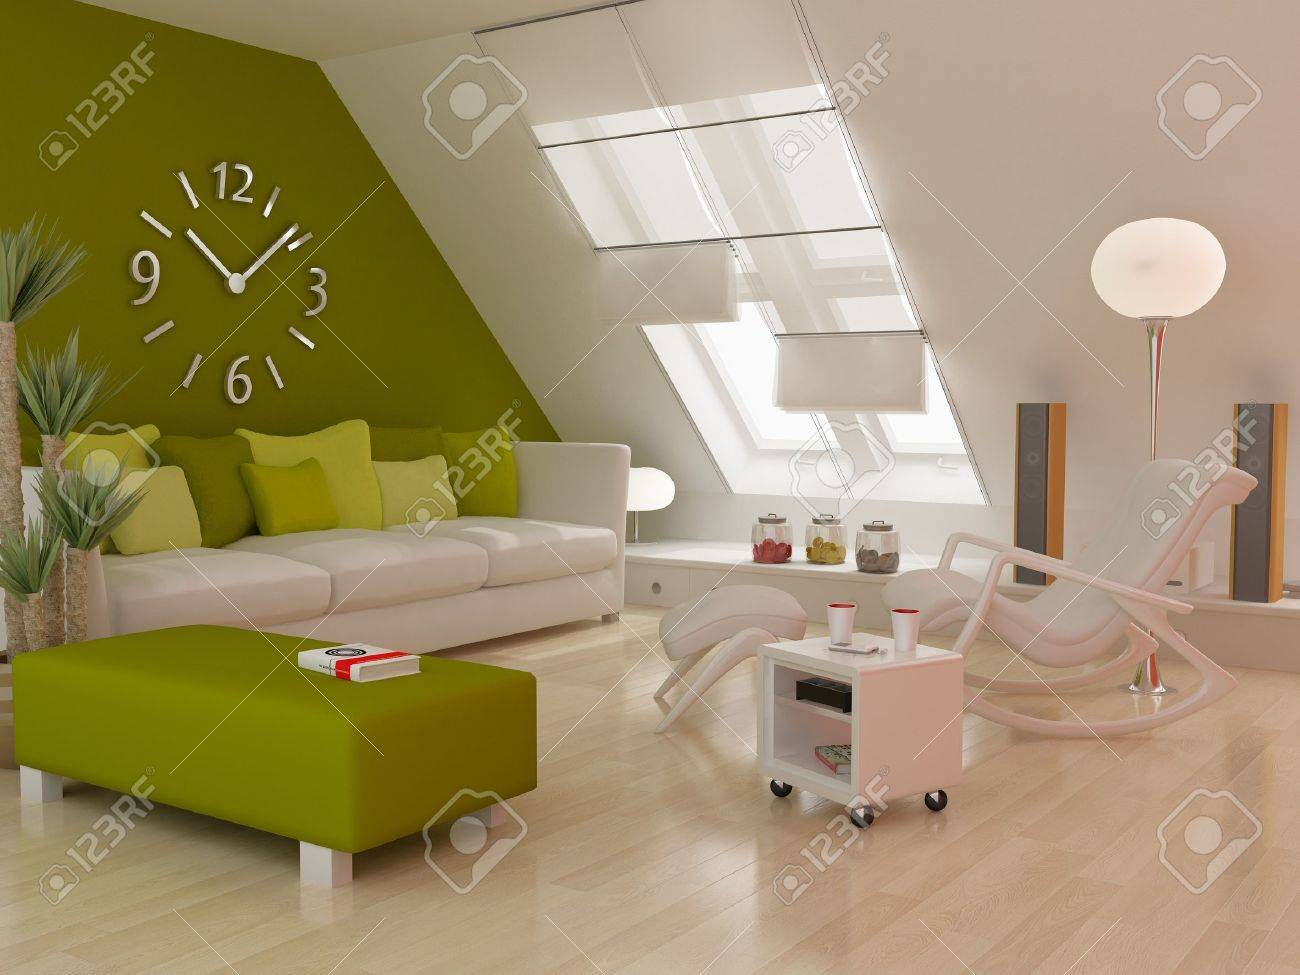 Modern interior (3D Render) - Living Room Stock Photo - 10348337